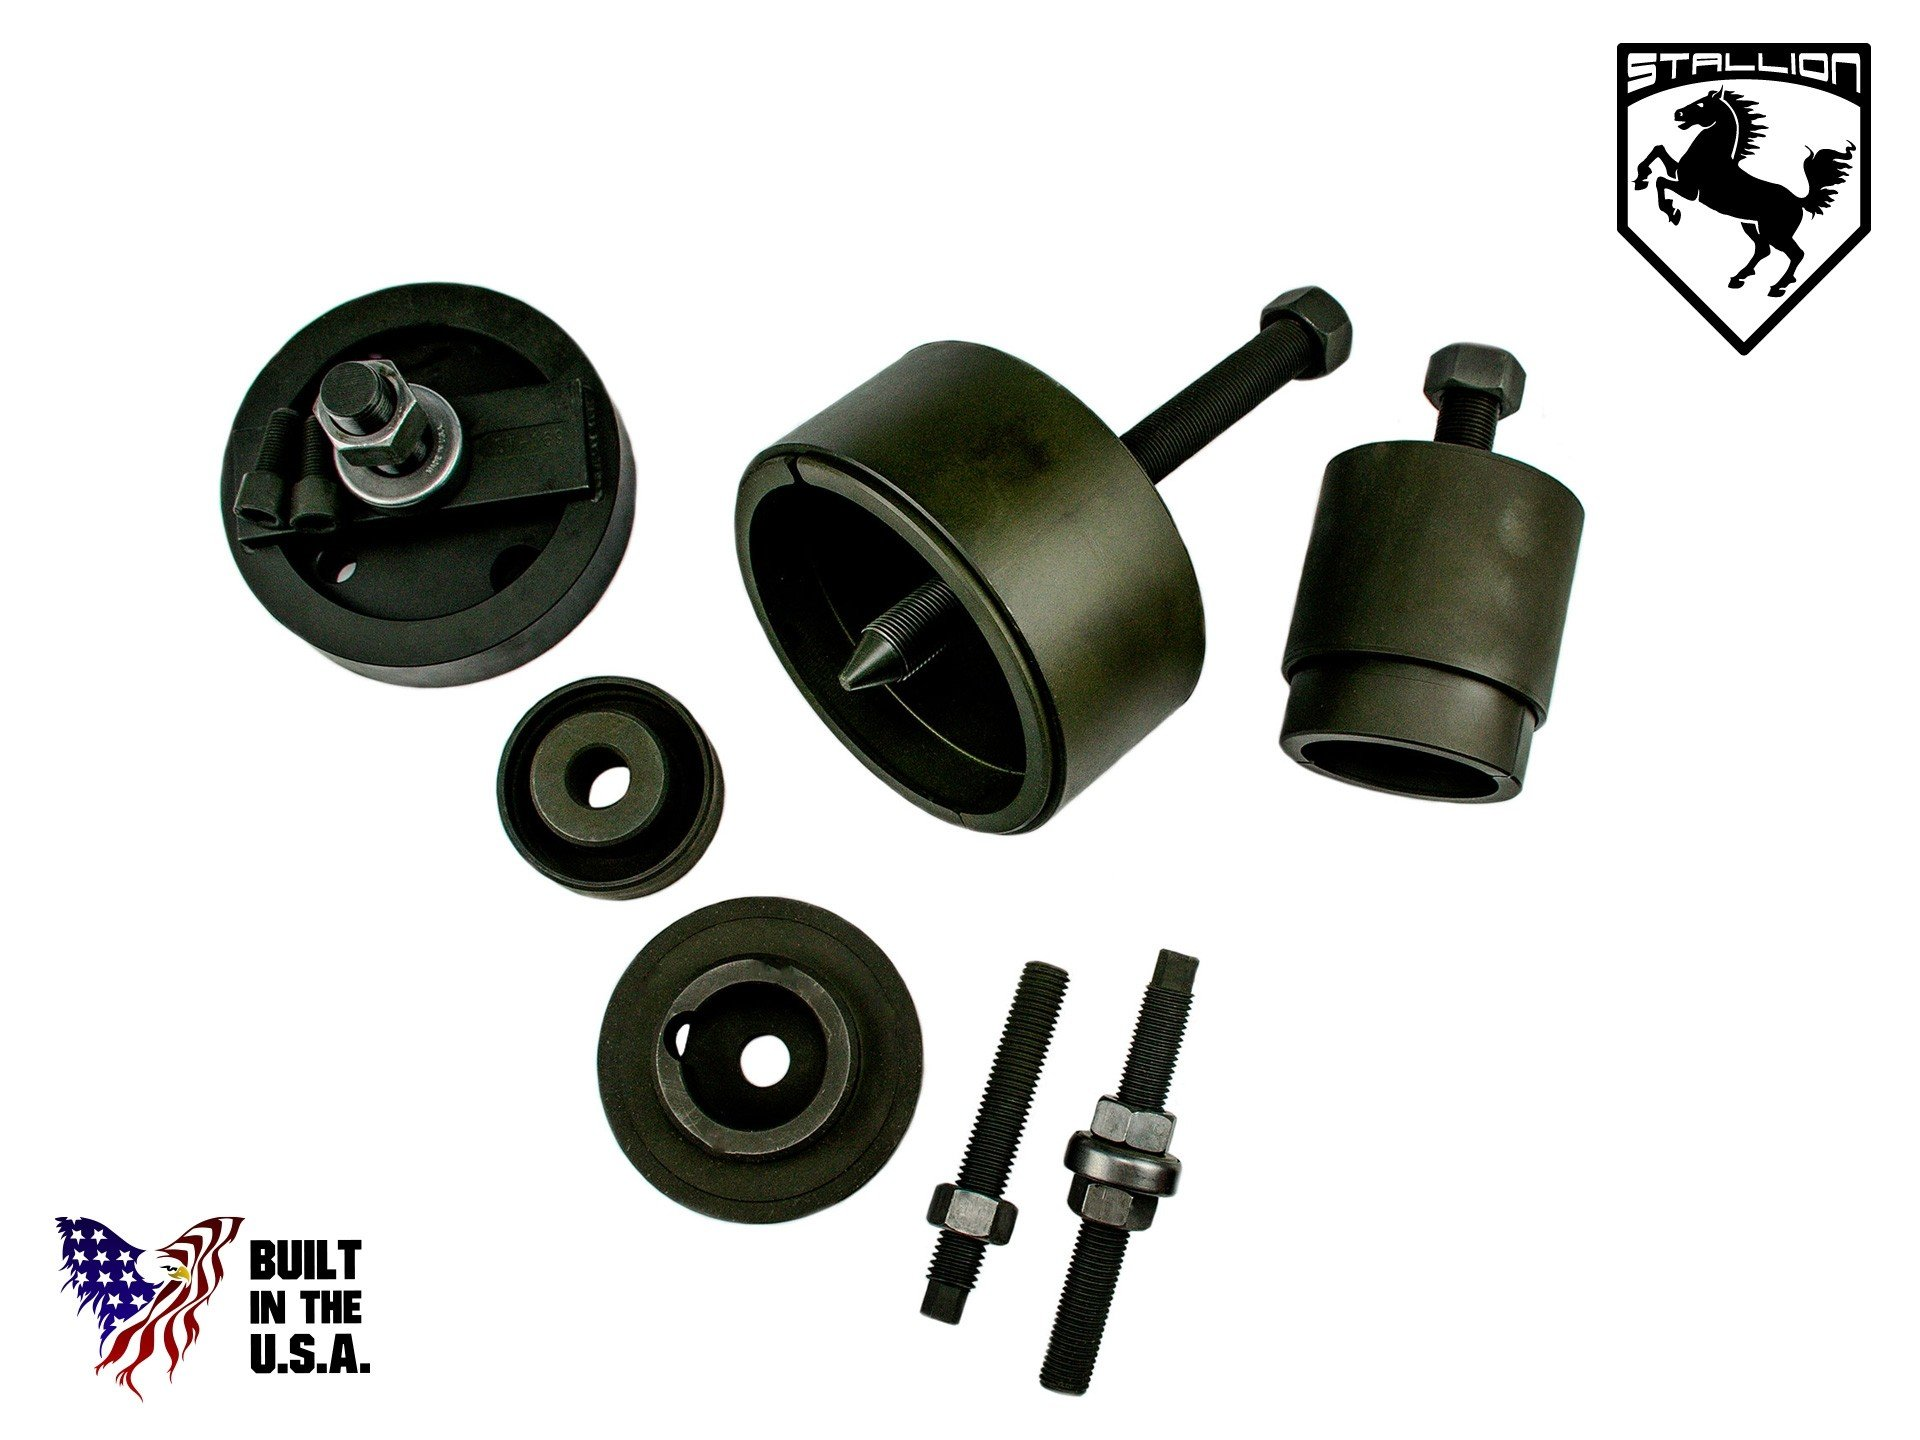 7 3L Powerstroke Front & Rear Crankshaft Seal & Wear Sleeve Installer &  Remover Set Alt ST-S914